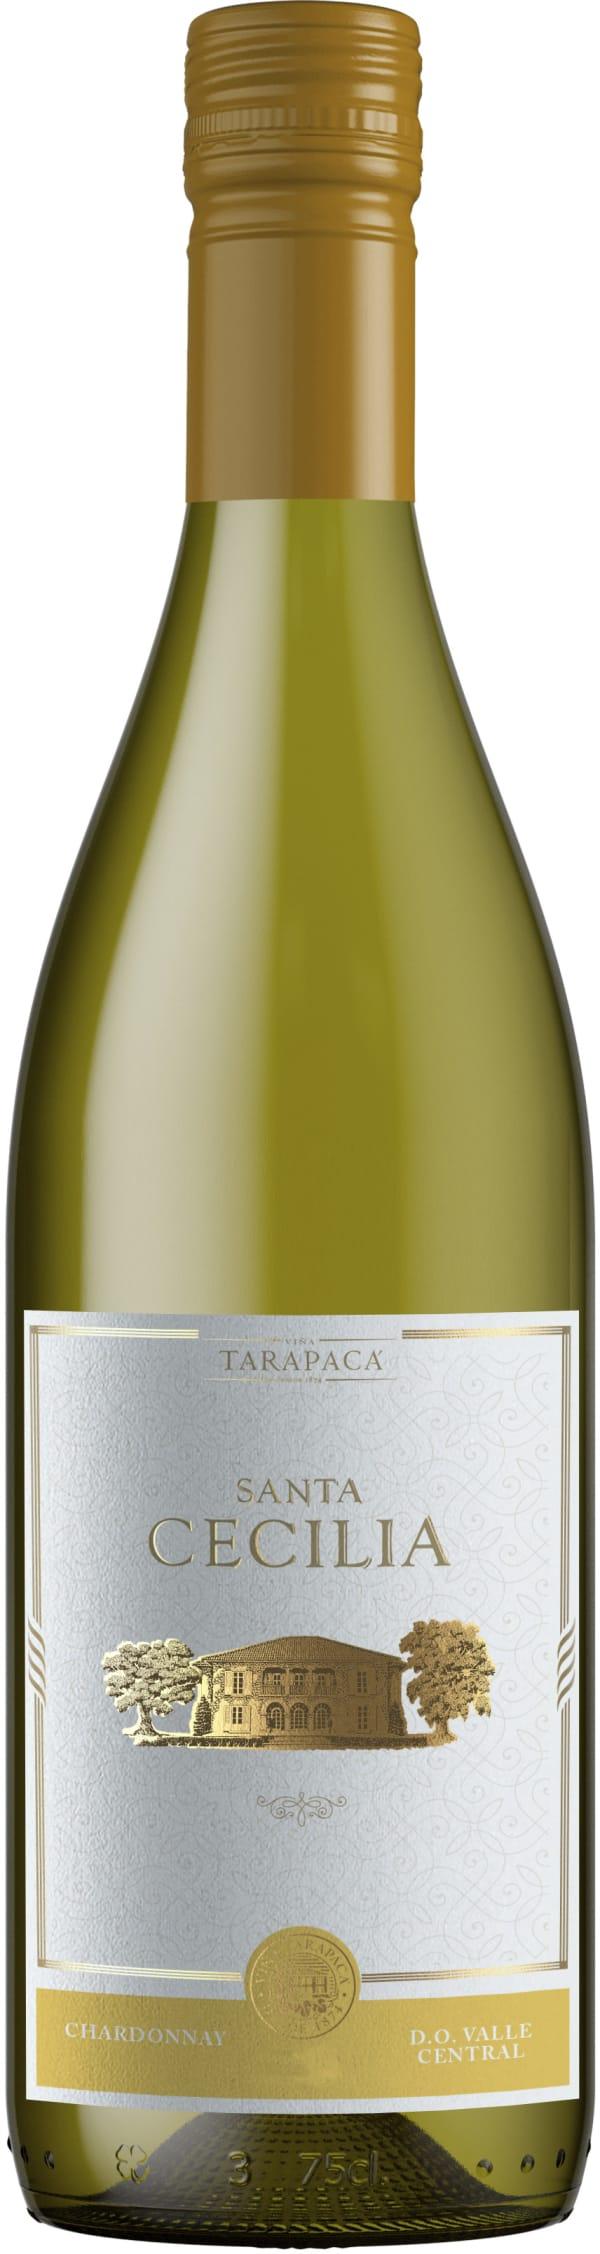 Tarapacá Santa Cecilia Chardonnay 2019